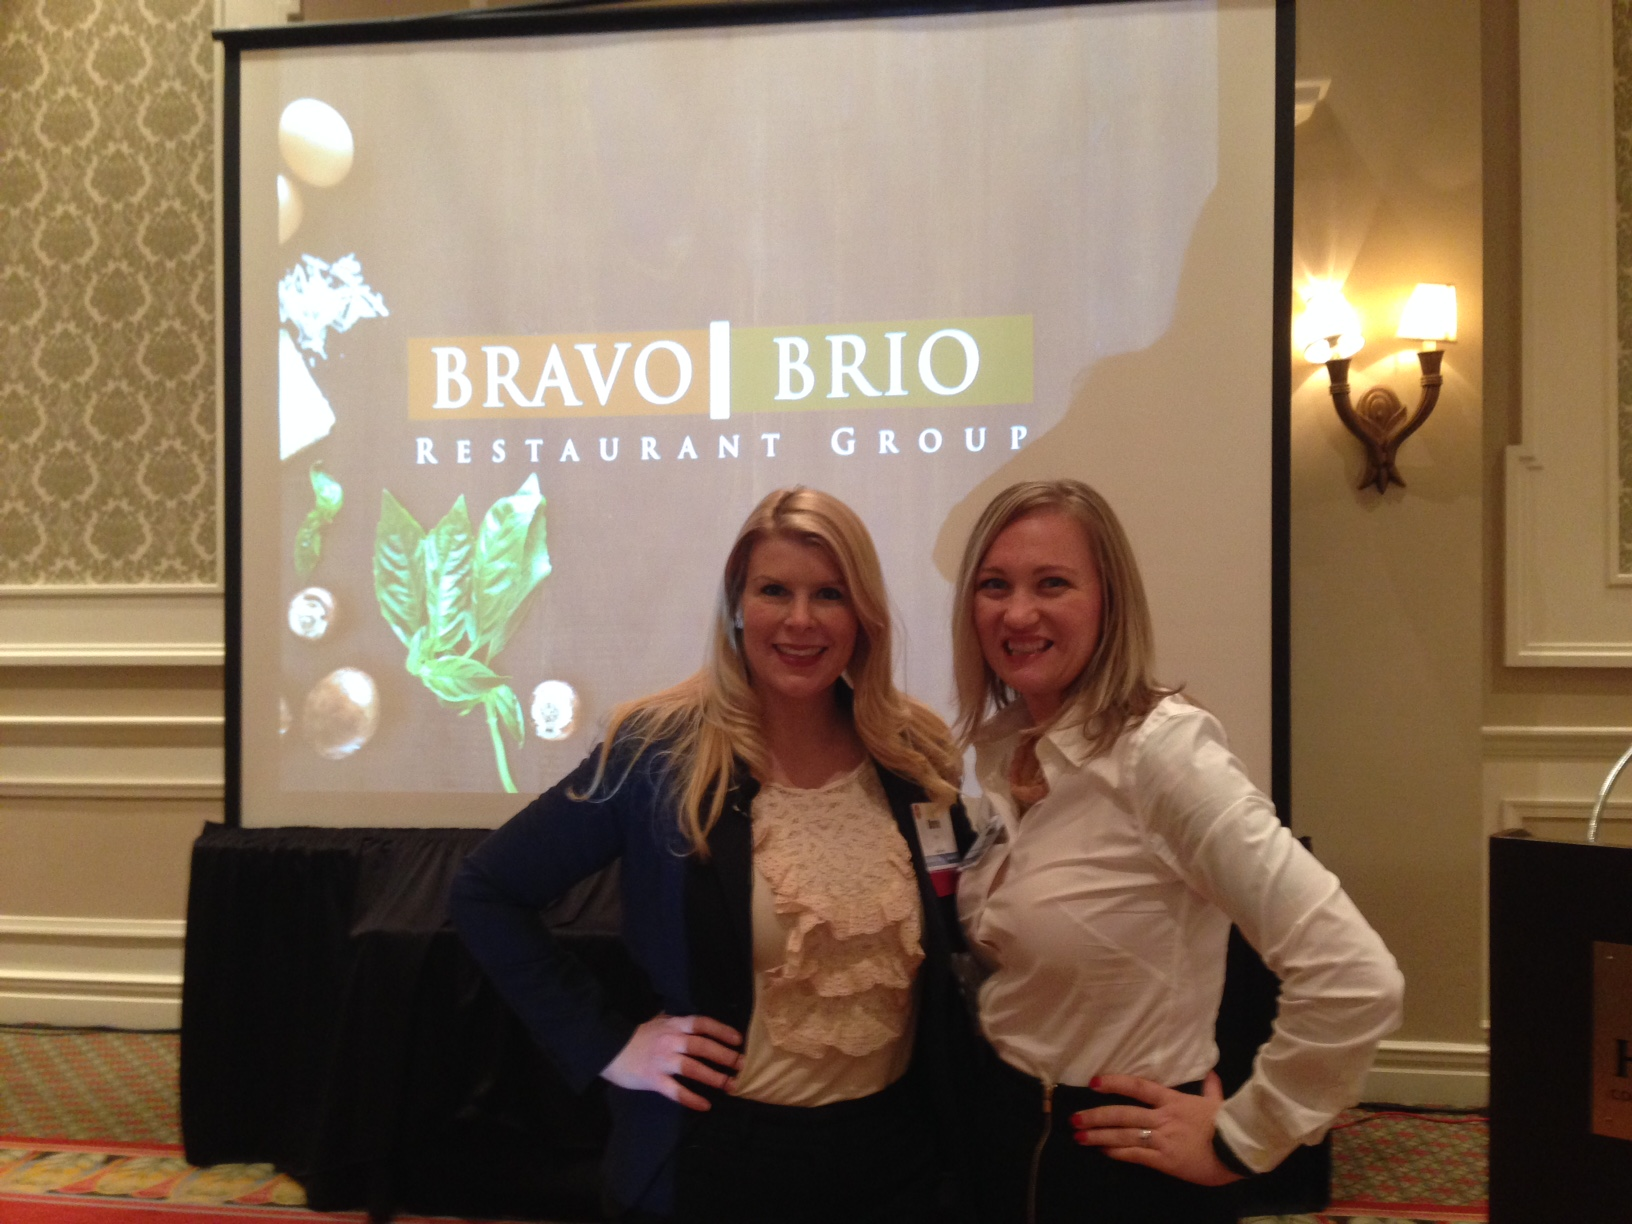 Bravo Brio restaurant group Durée Ross